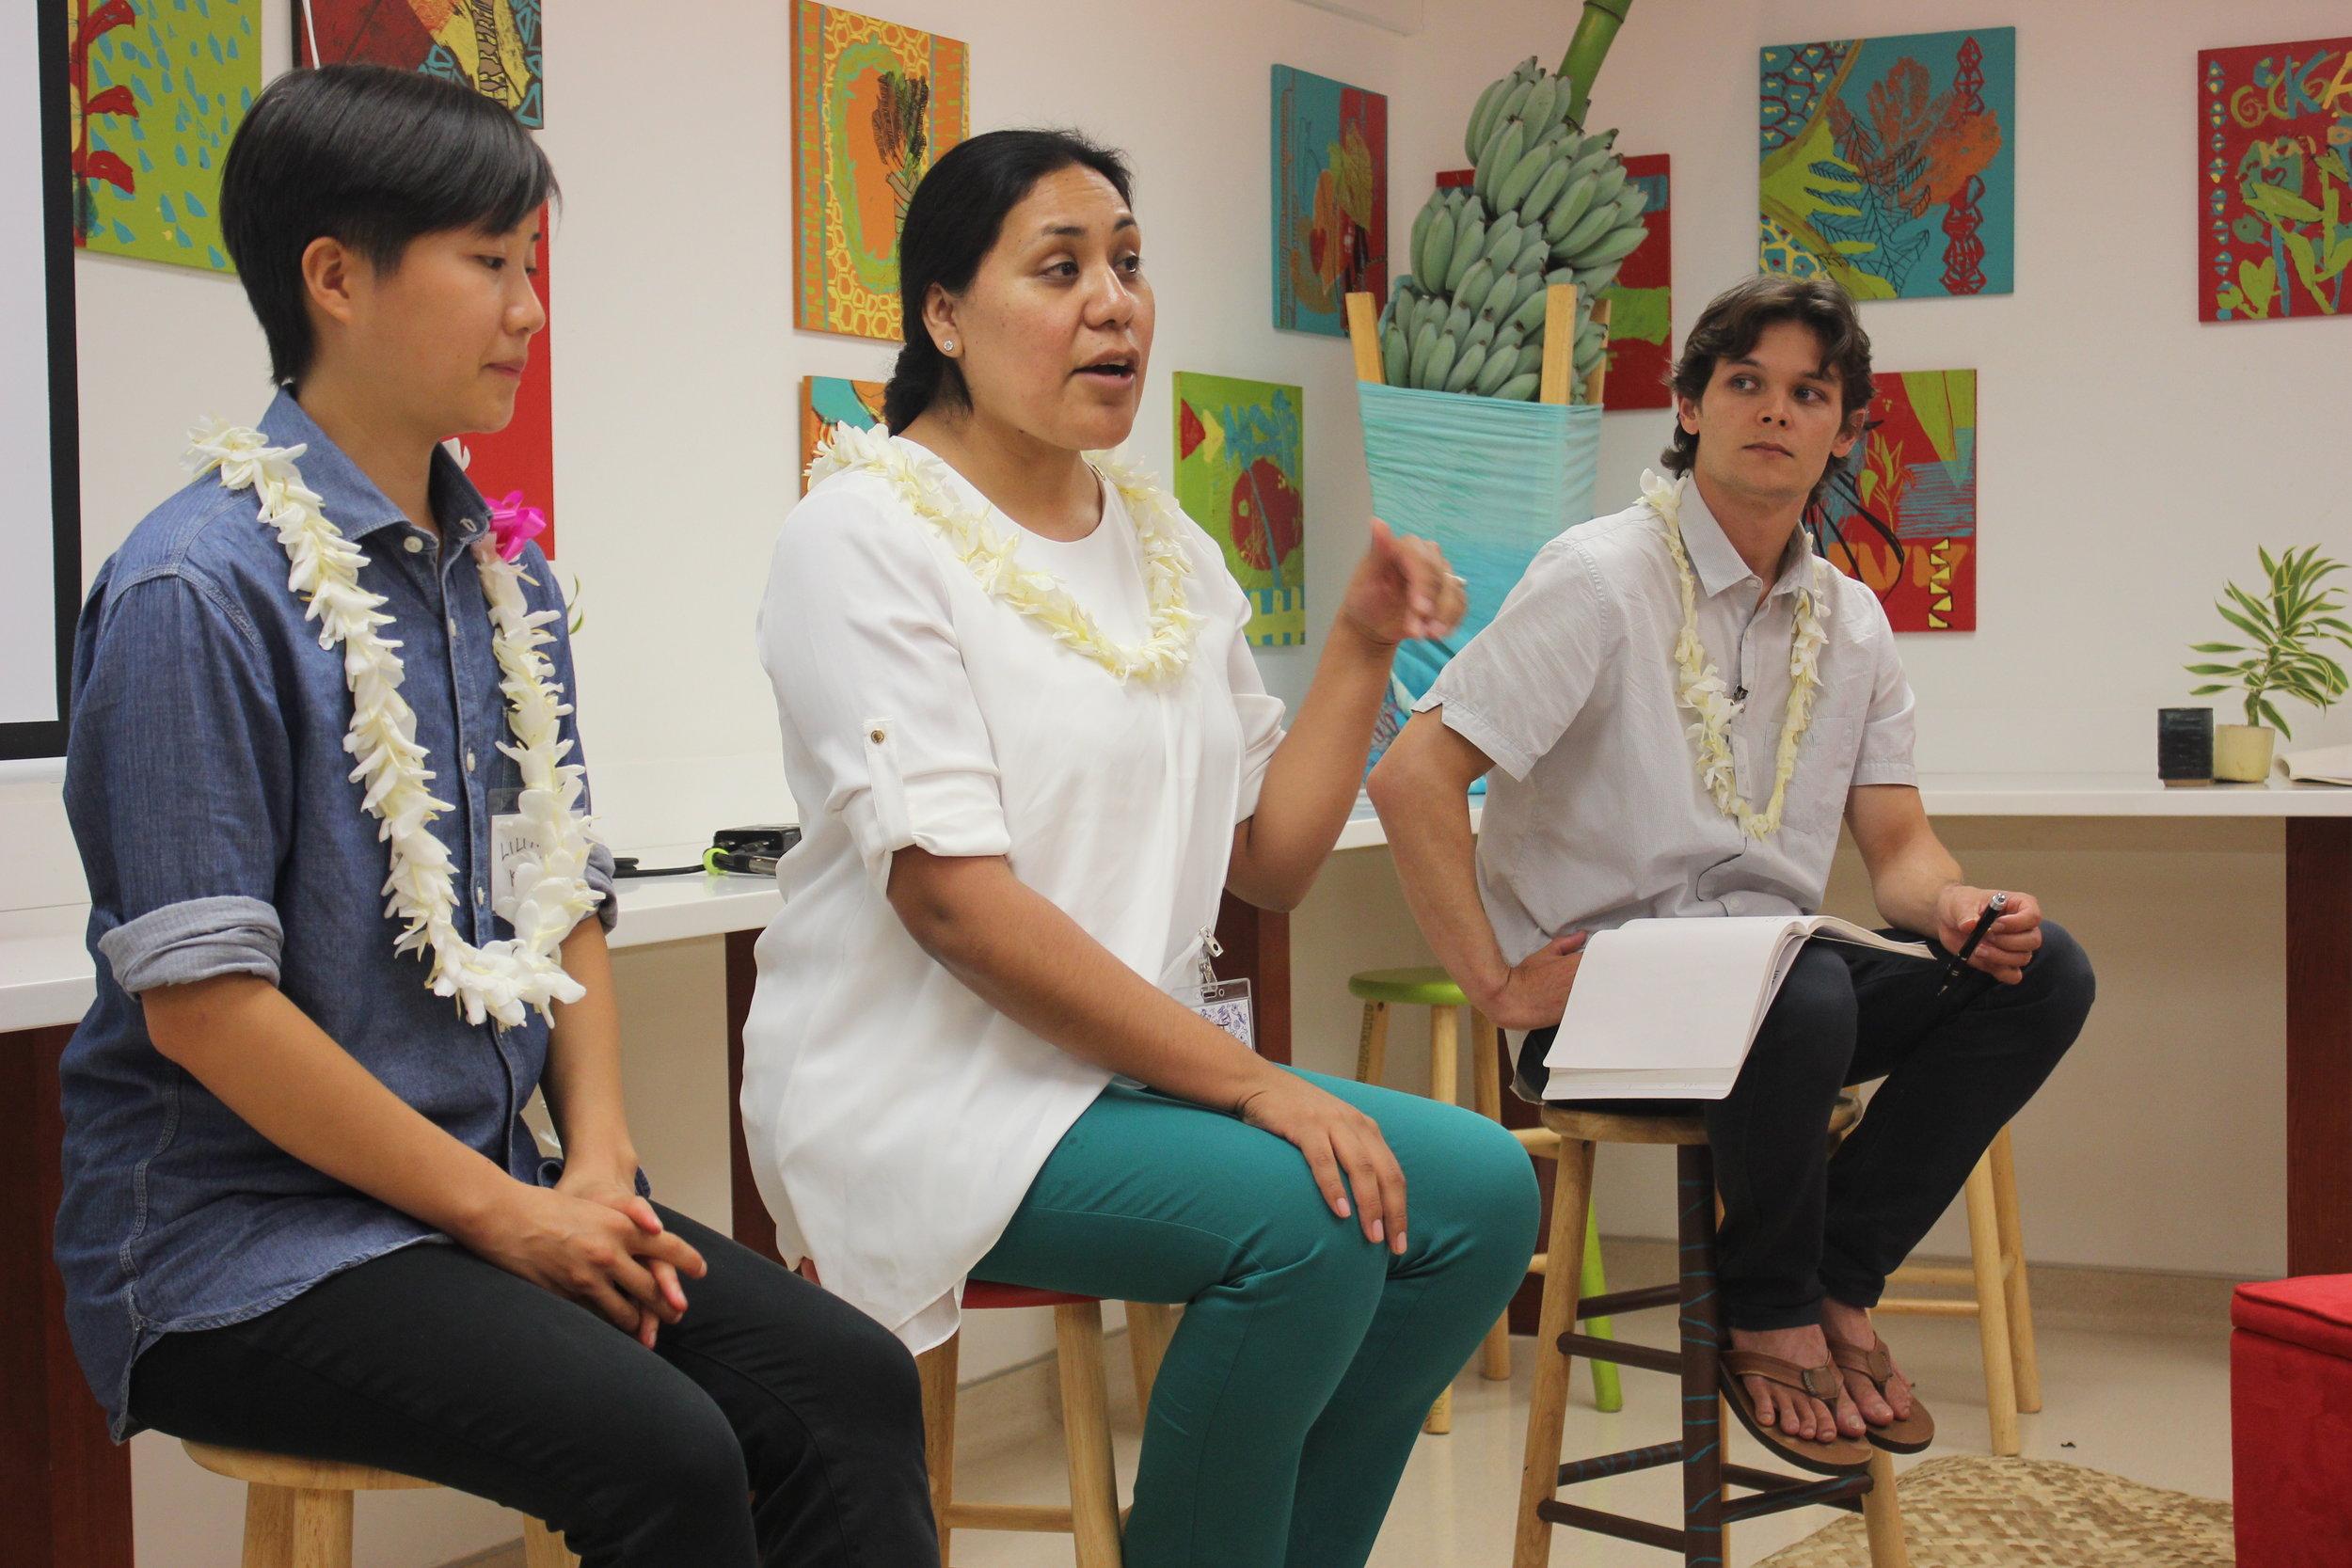 Presenter panel, left to right: Lilian Kong; A-dae Romero-Briones; Frederick Reppun